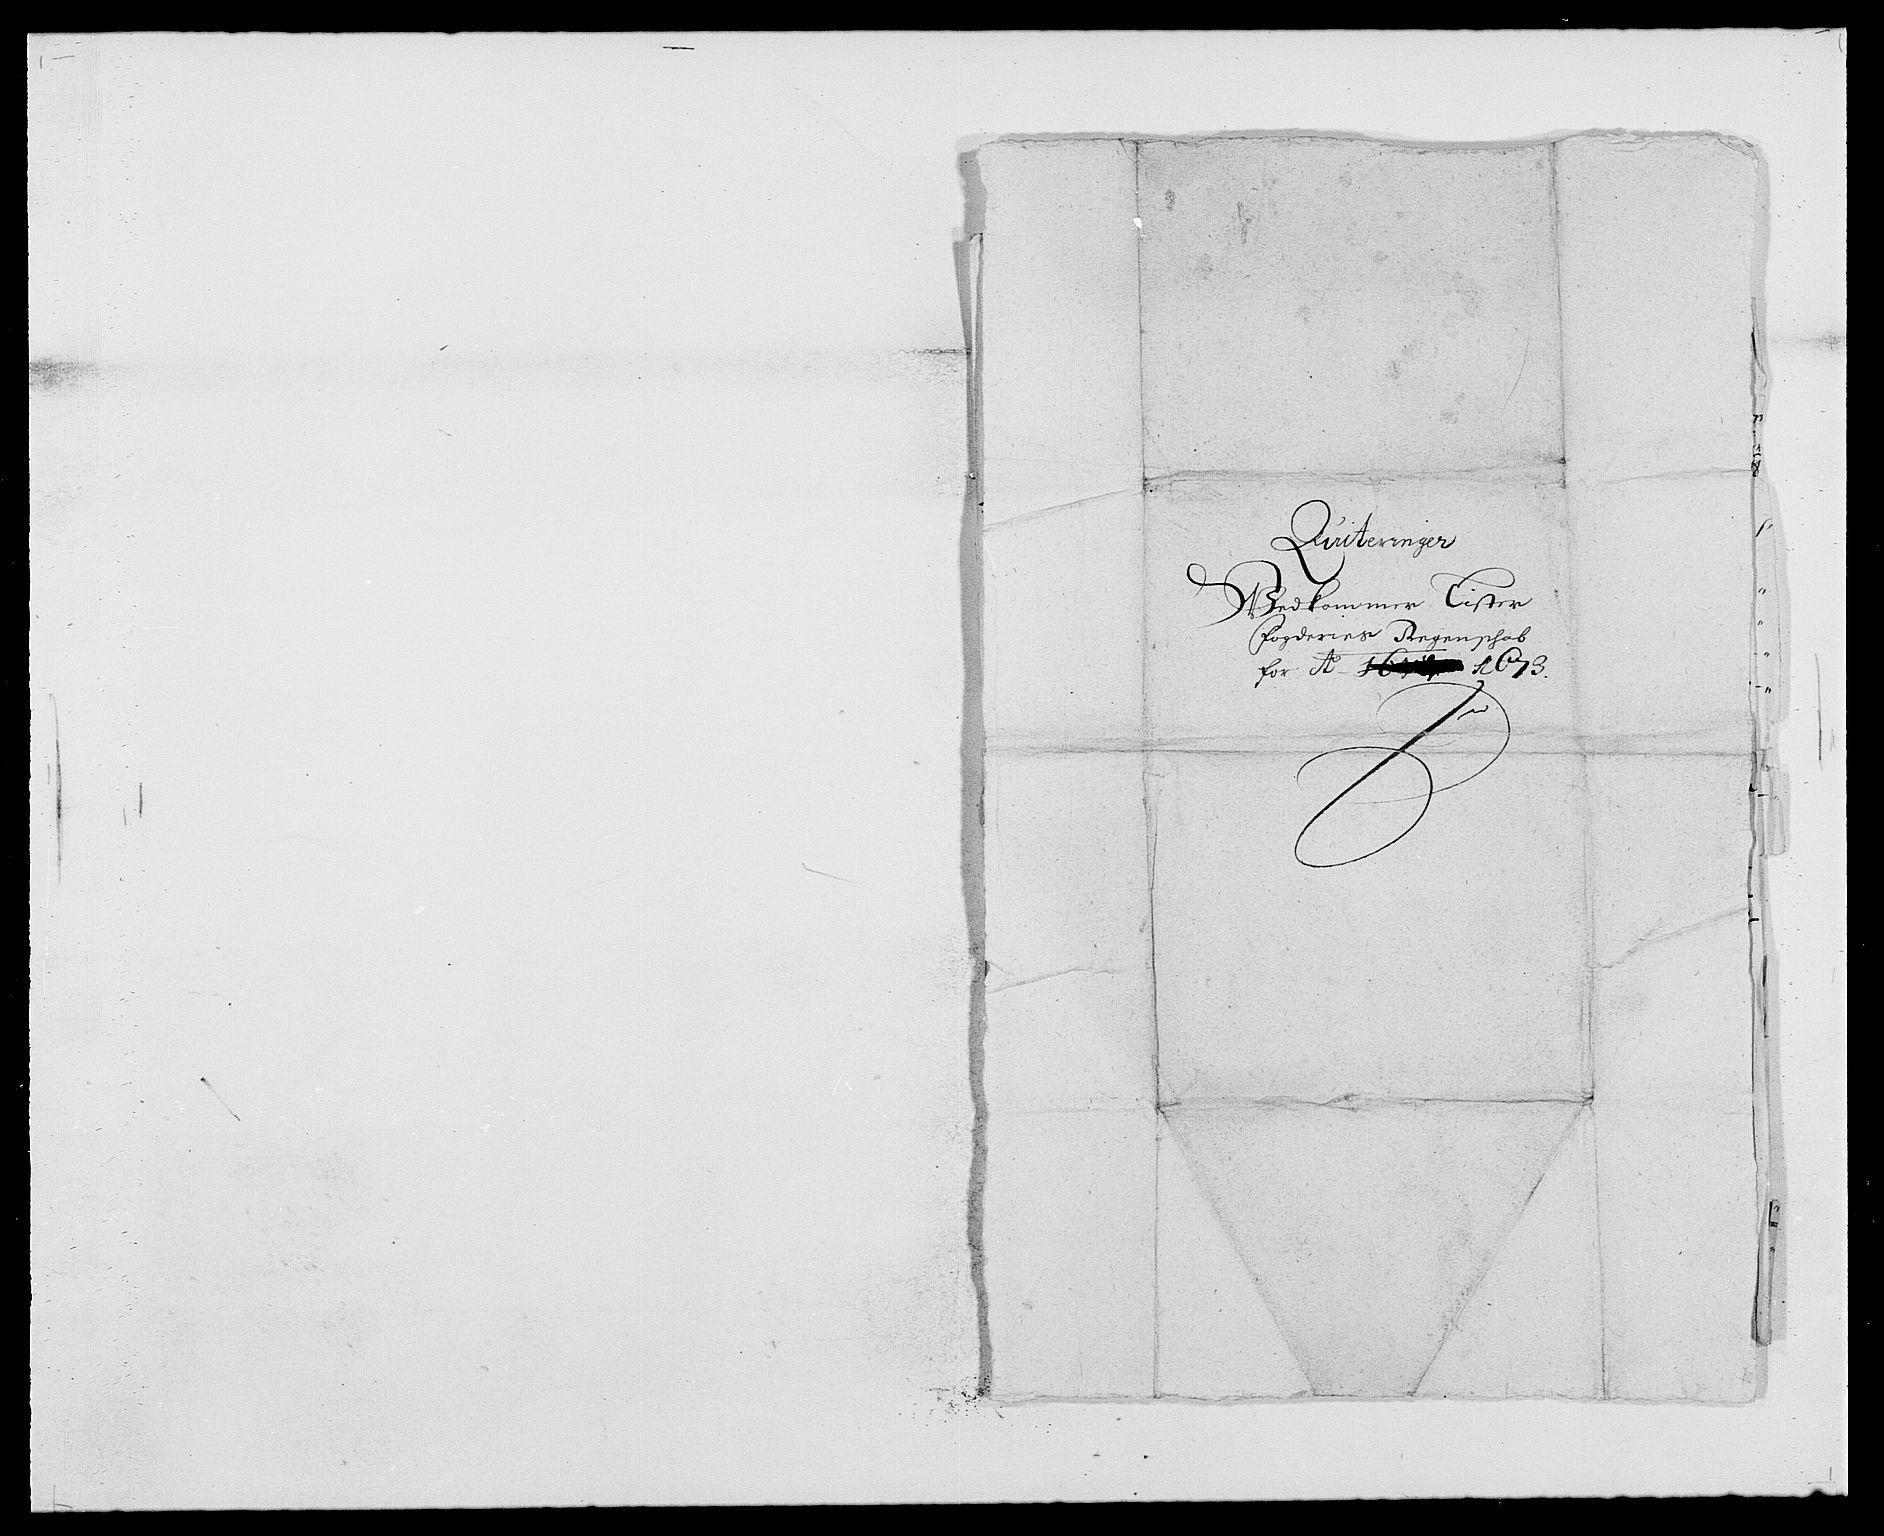 RA, Rentekammeret inntil 1814, Reviderte regnskaper, Fogderegnskap, R41/L2528: Fogderegnskap Lista, 1673-1674, s. 148